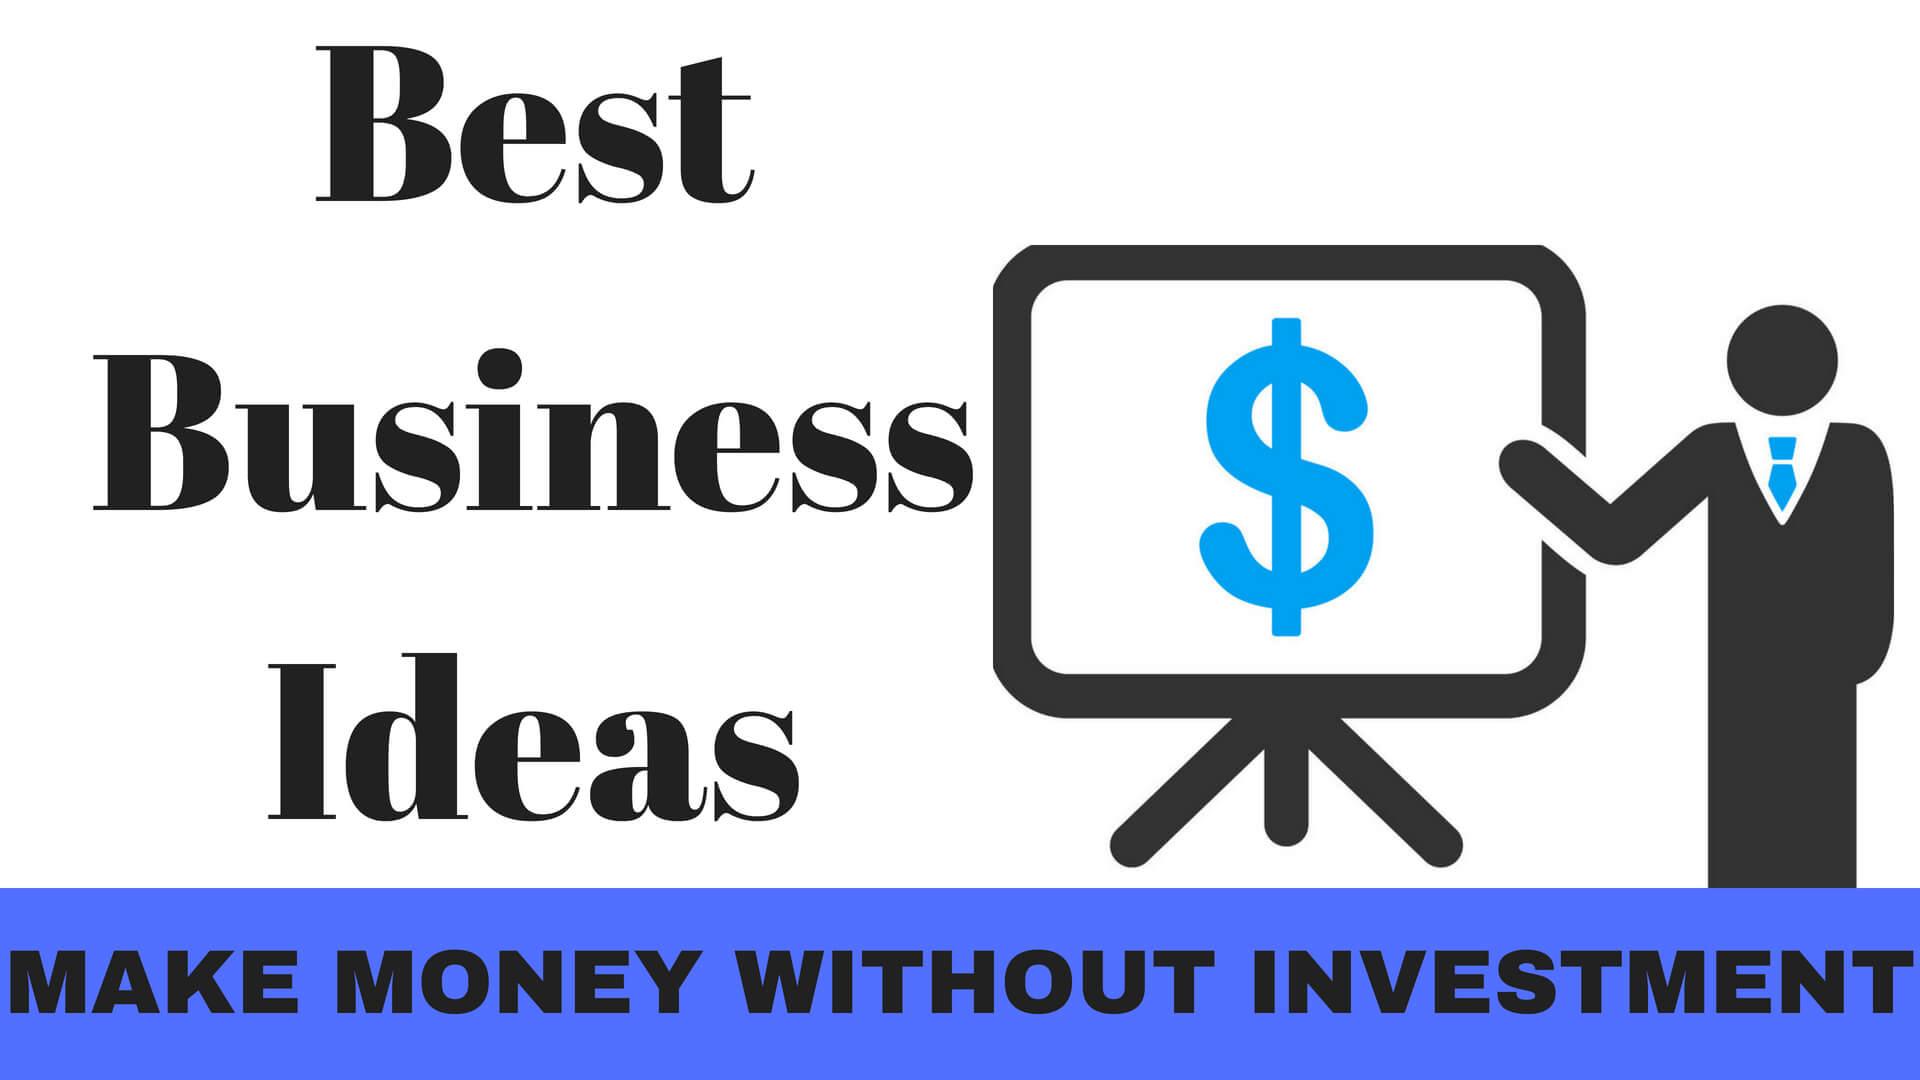 ऑनलाइन बिज़नस शुरू करे बिना पैसा लगाये